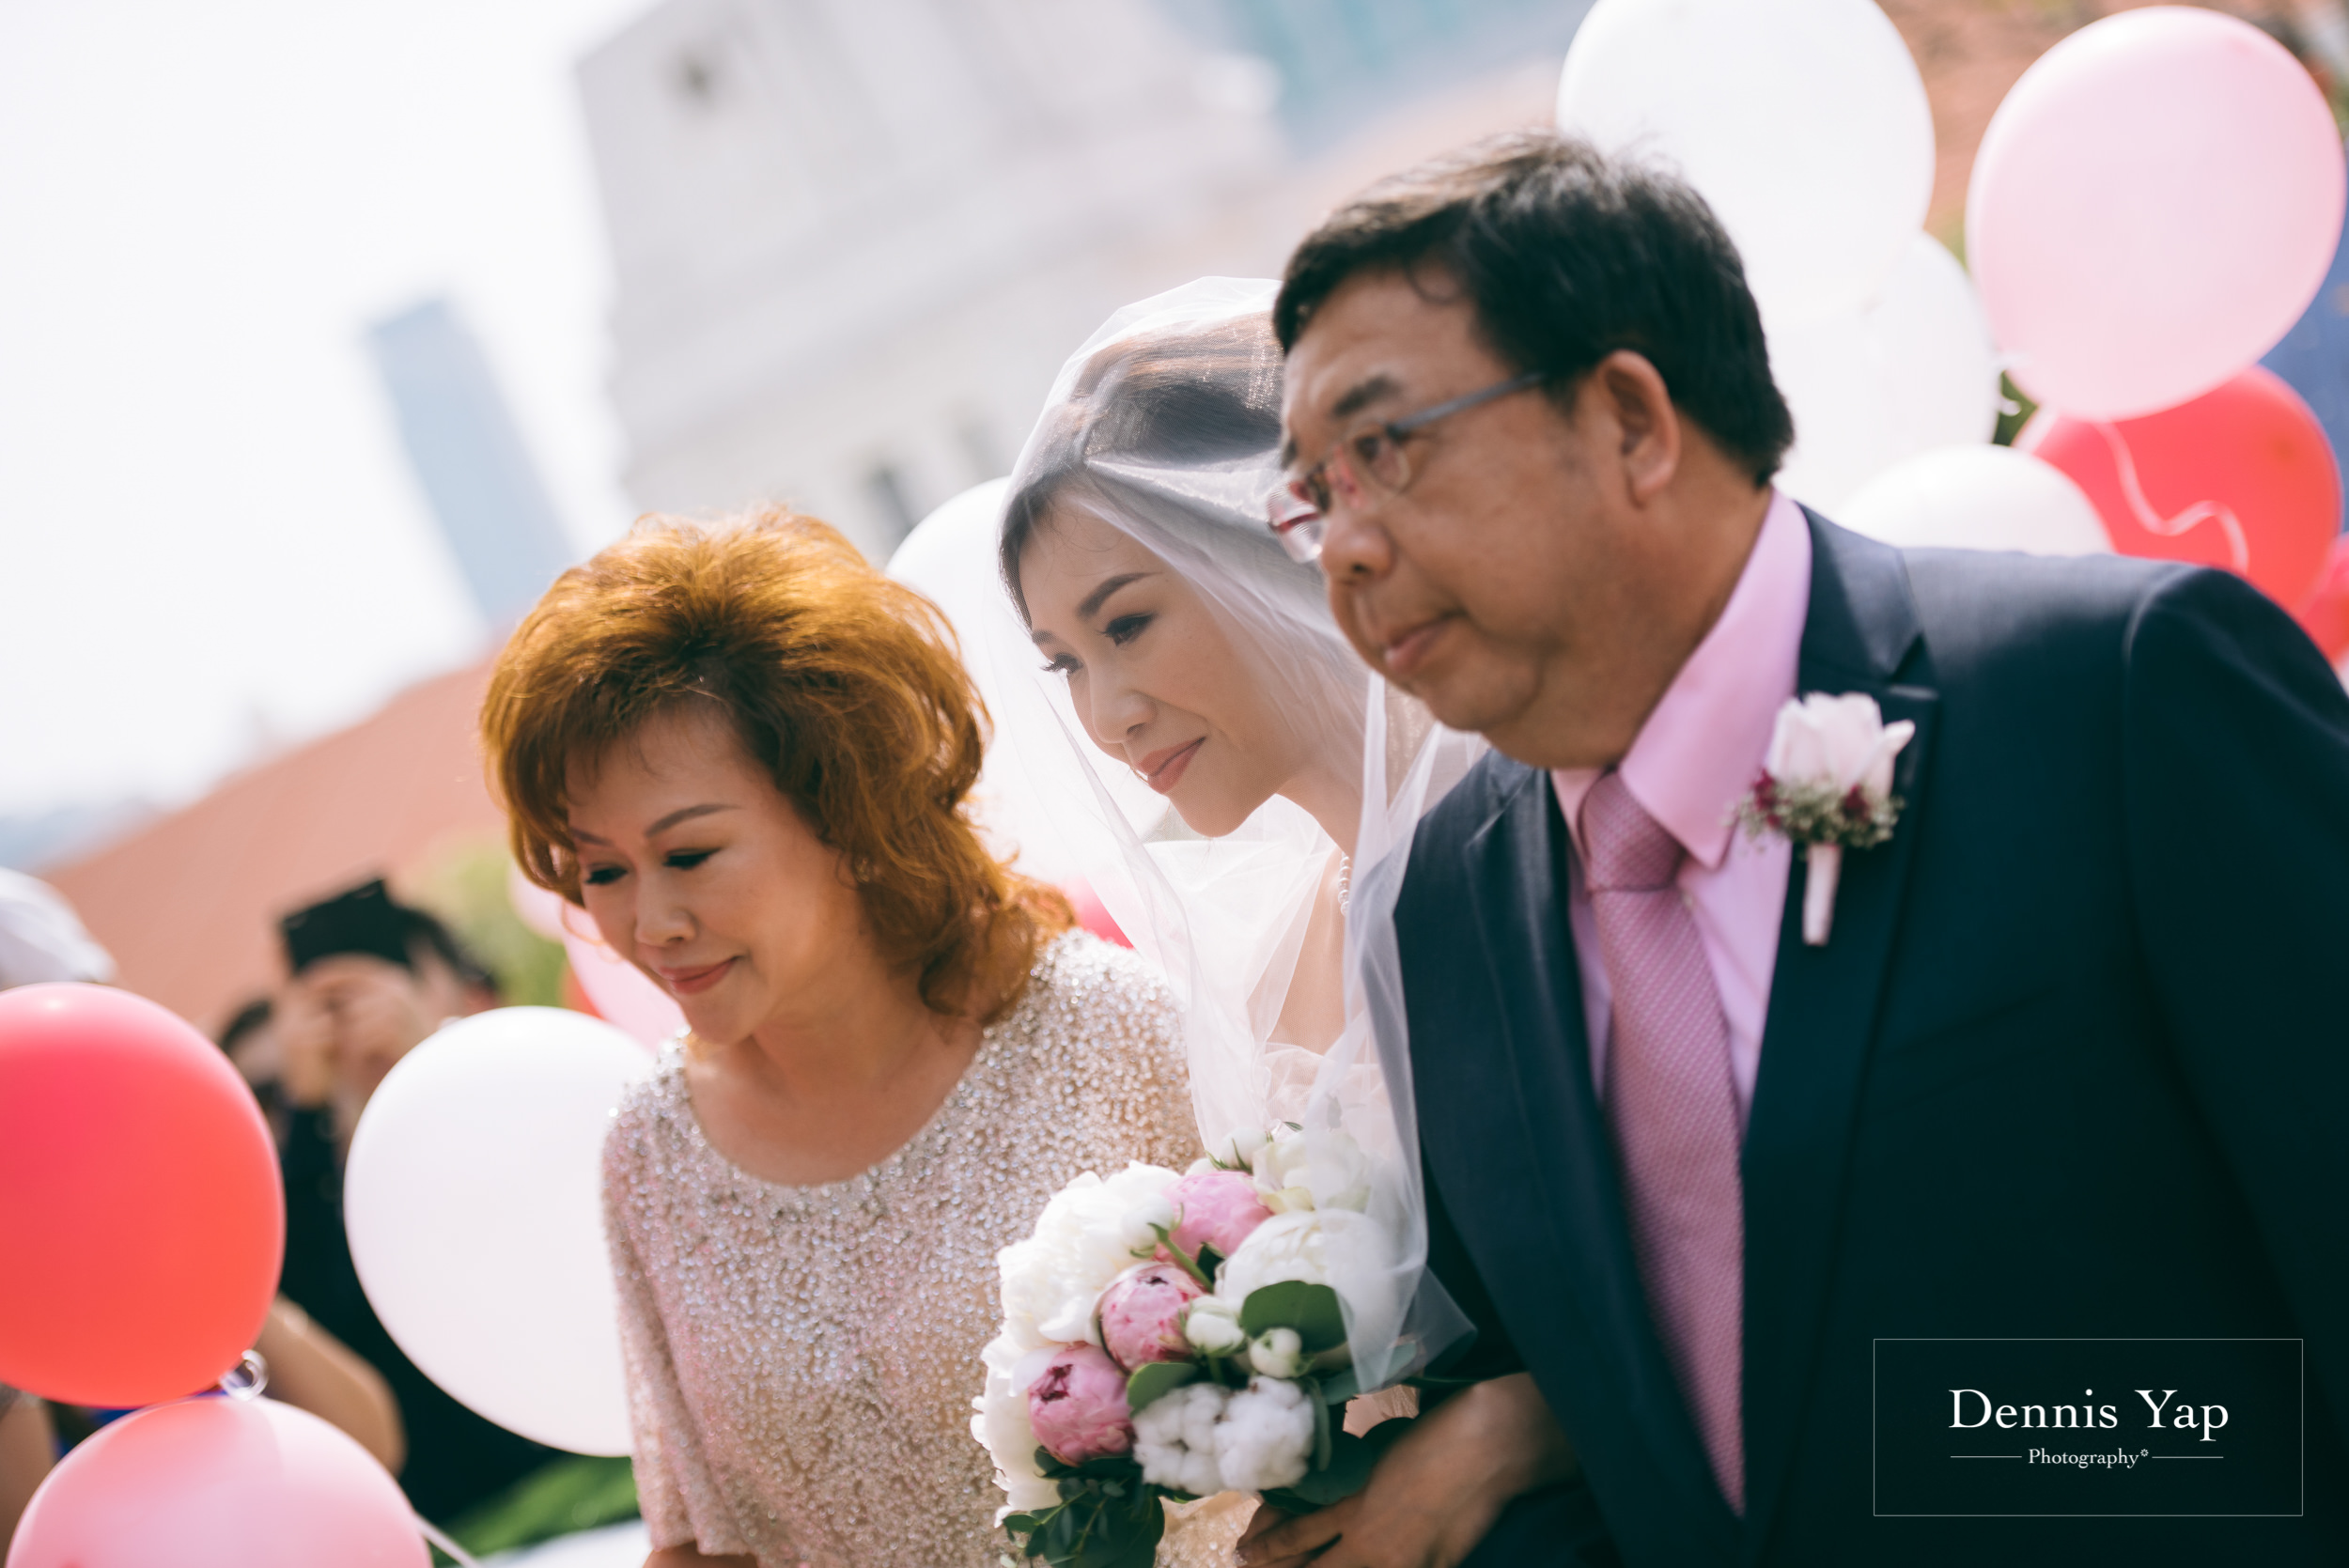 lionel joanne garden wedding majestic hotel dennis yap photography malaysia top wedding photographer-33.jpg